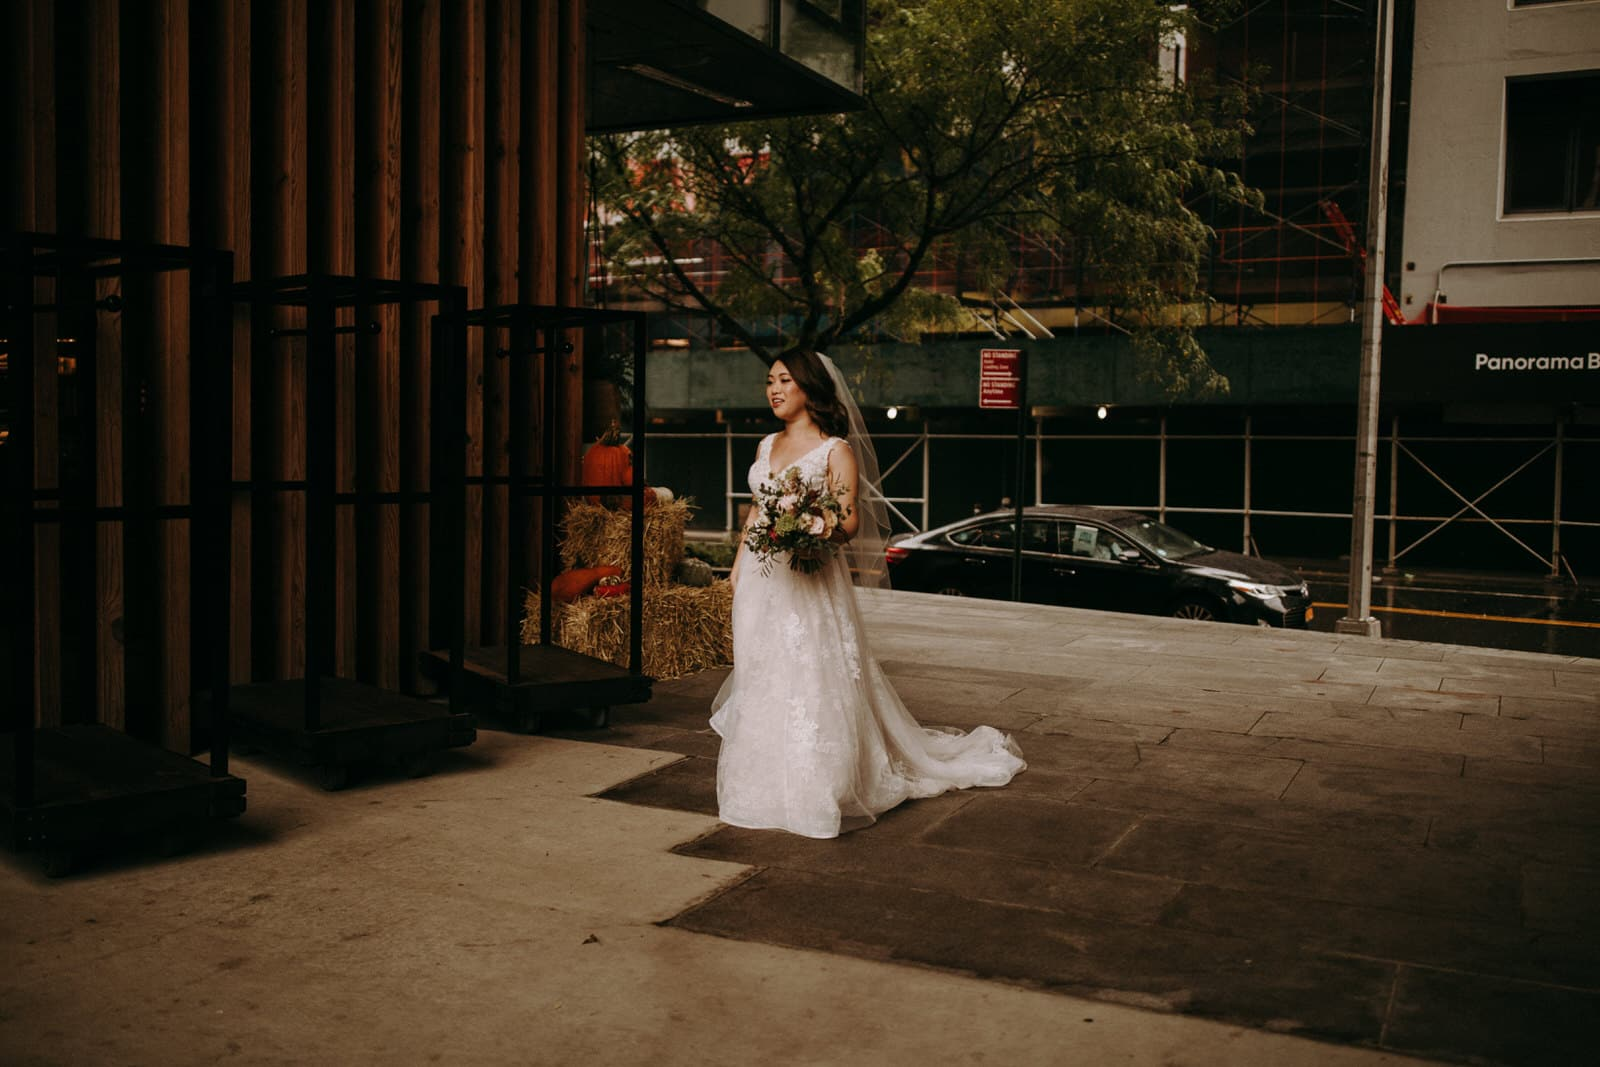 The bride is walking towards her groom.